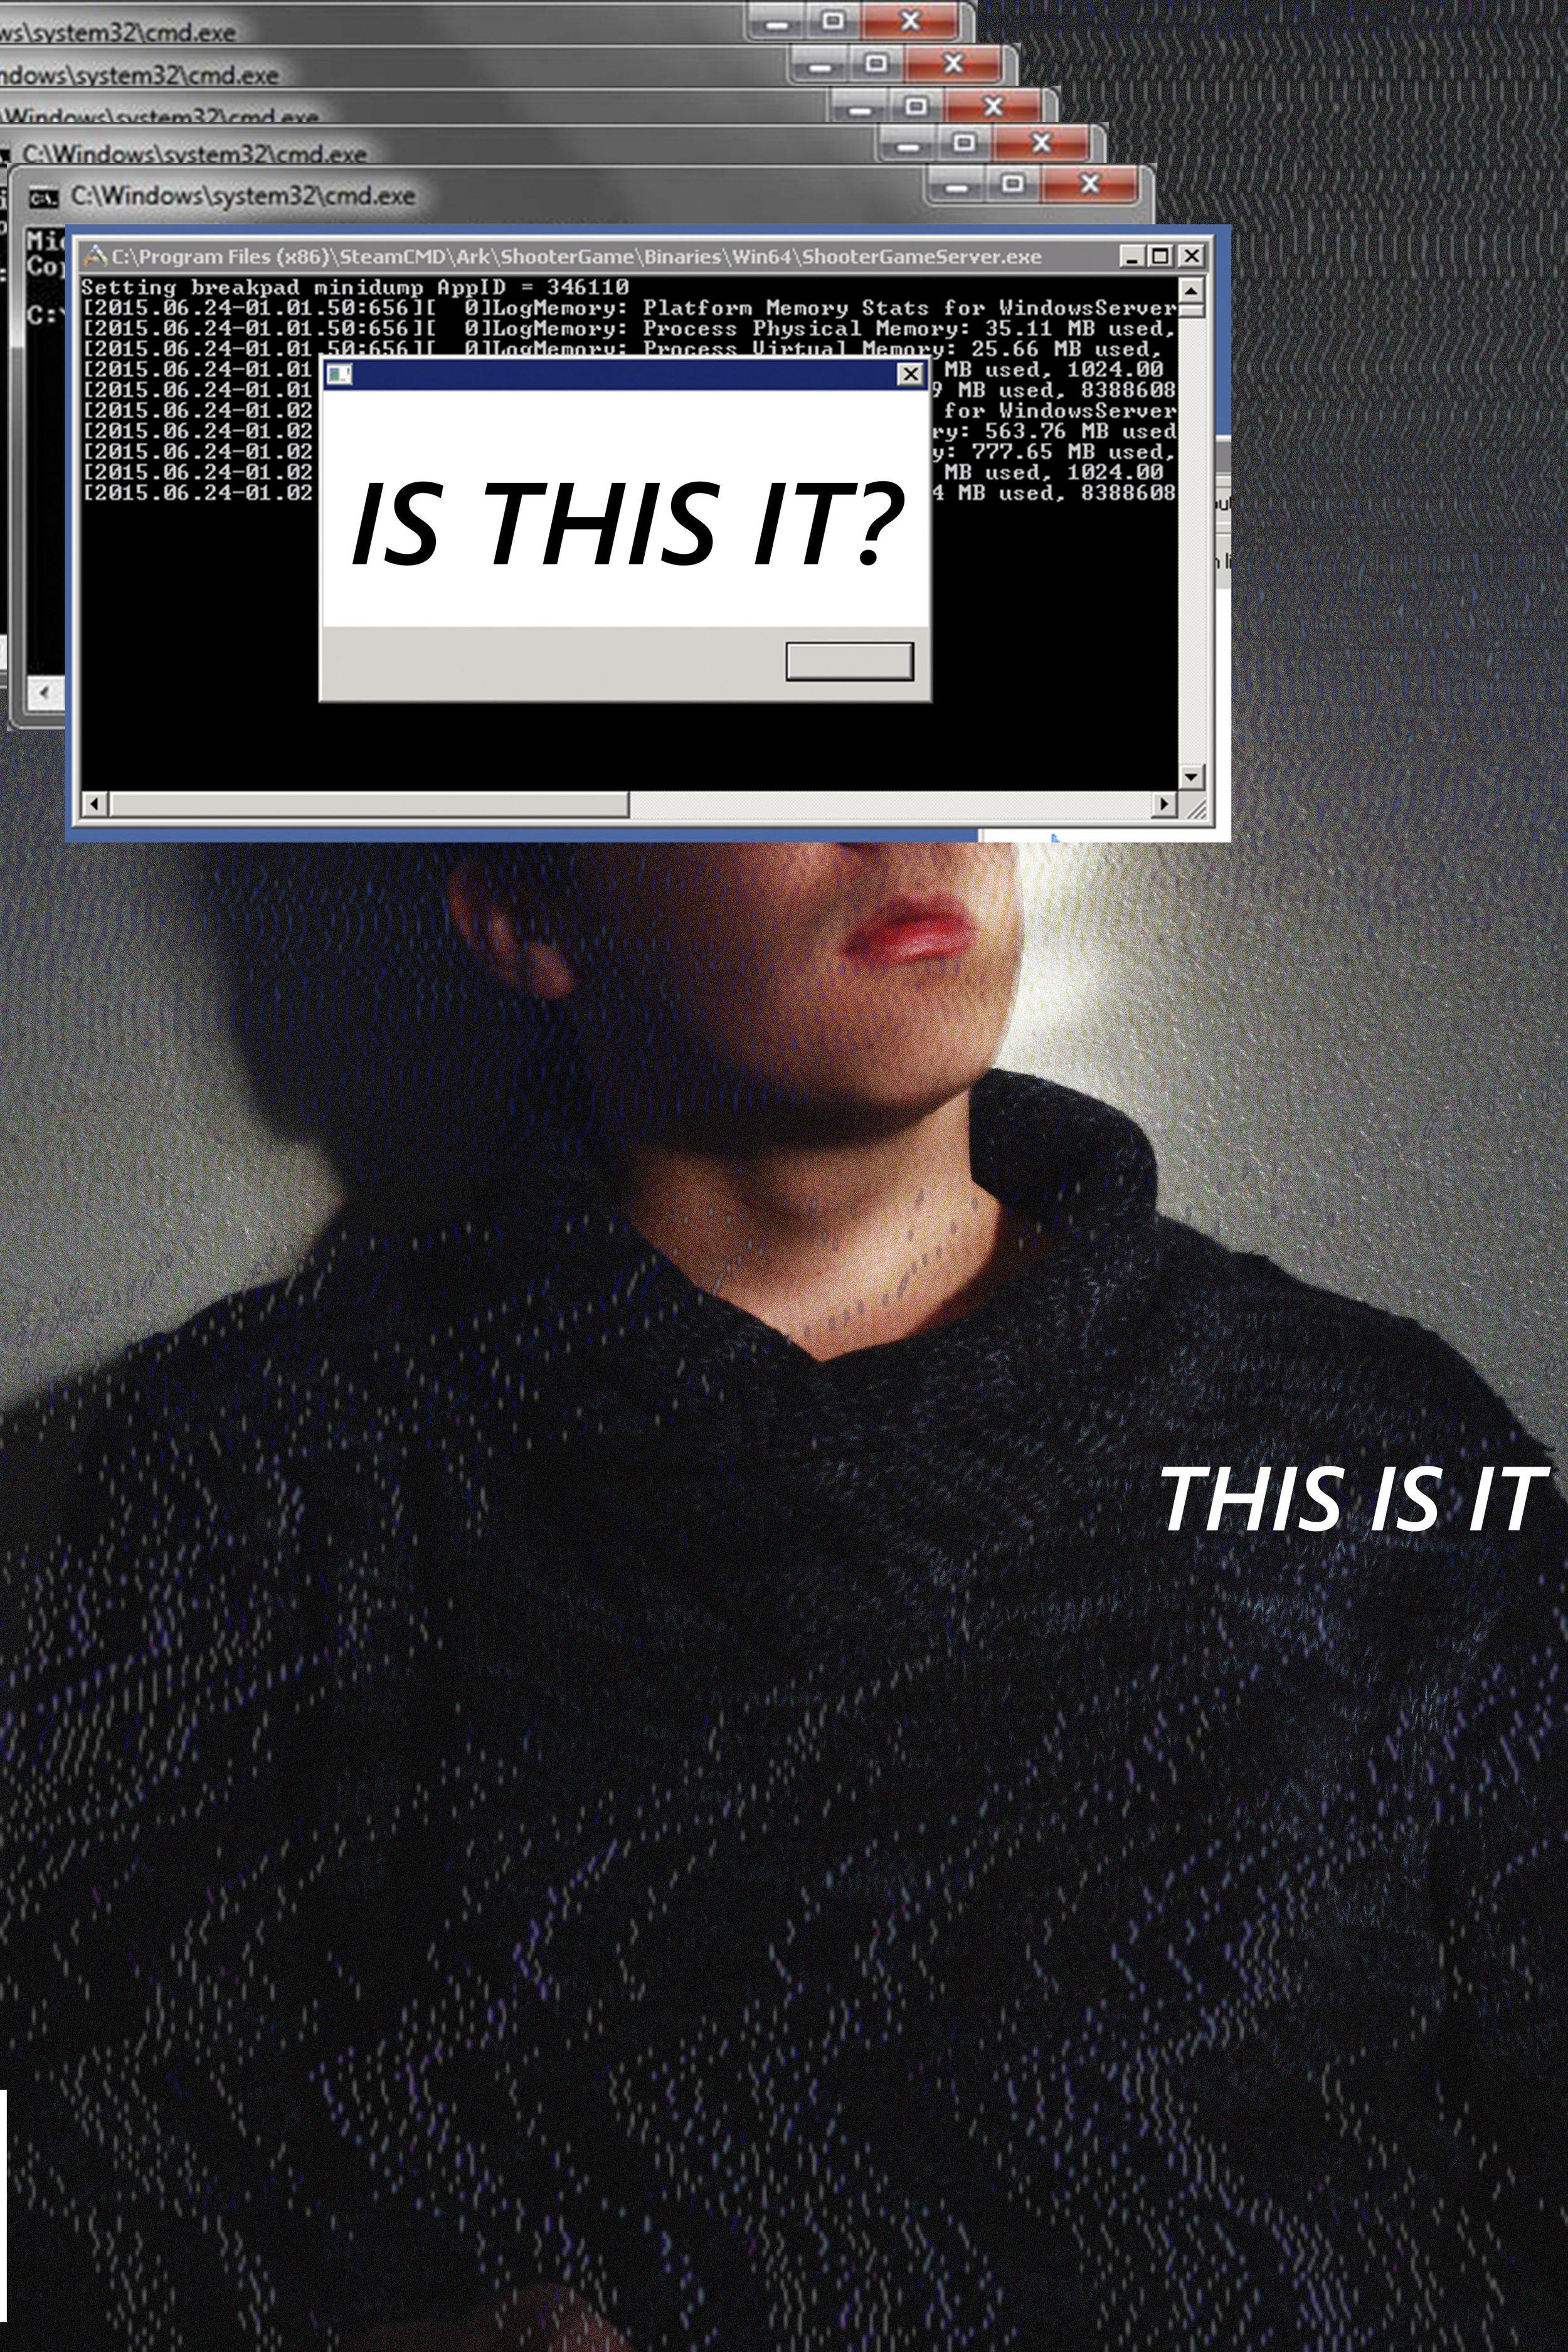 Is this it.jpg